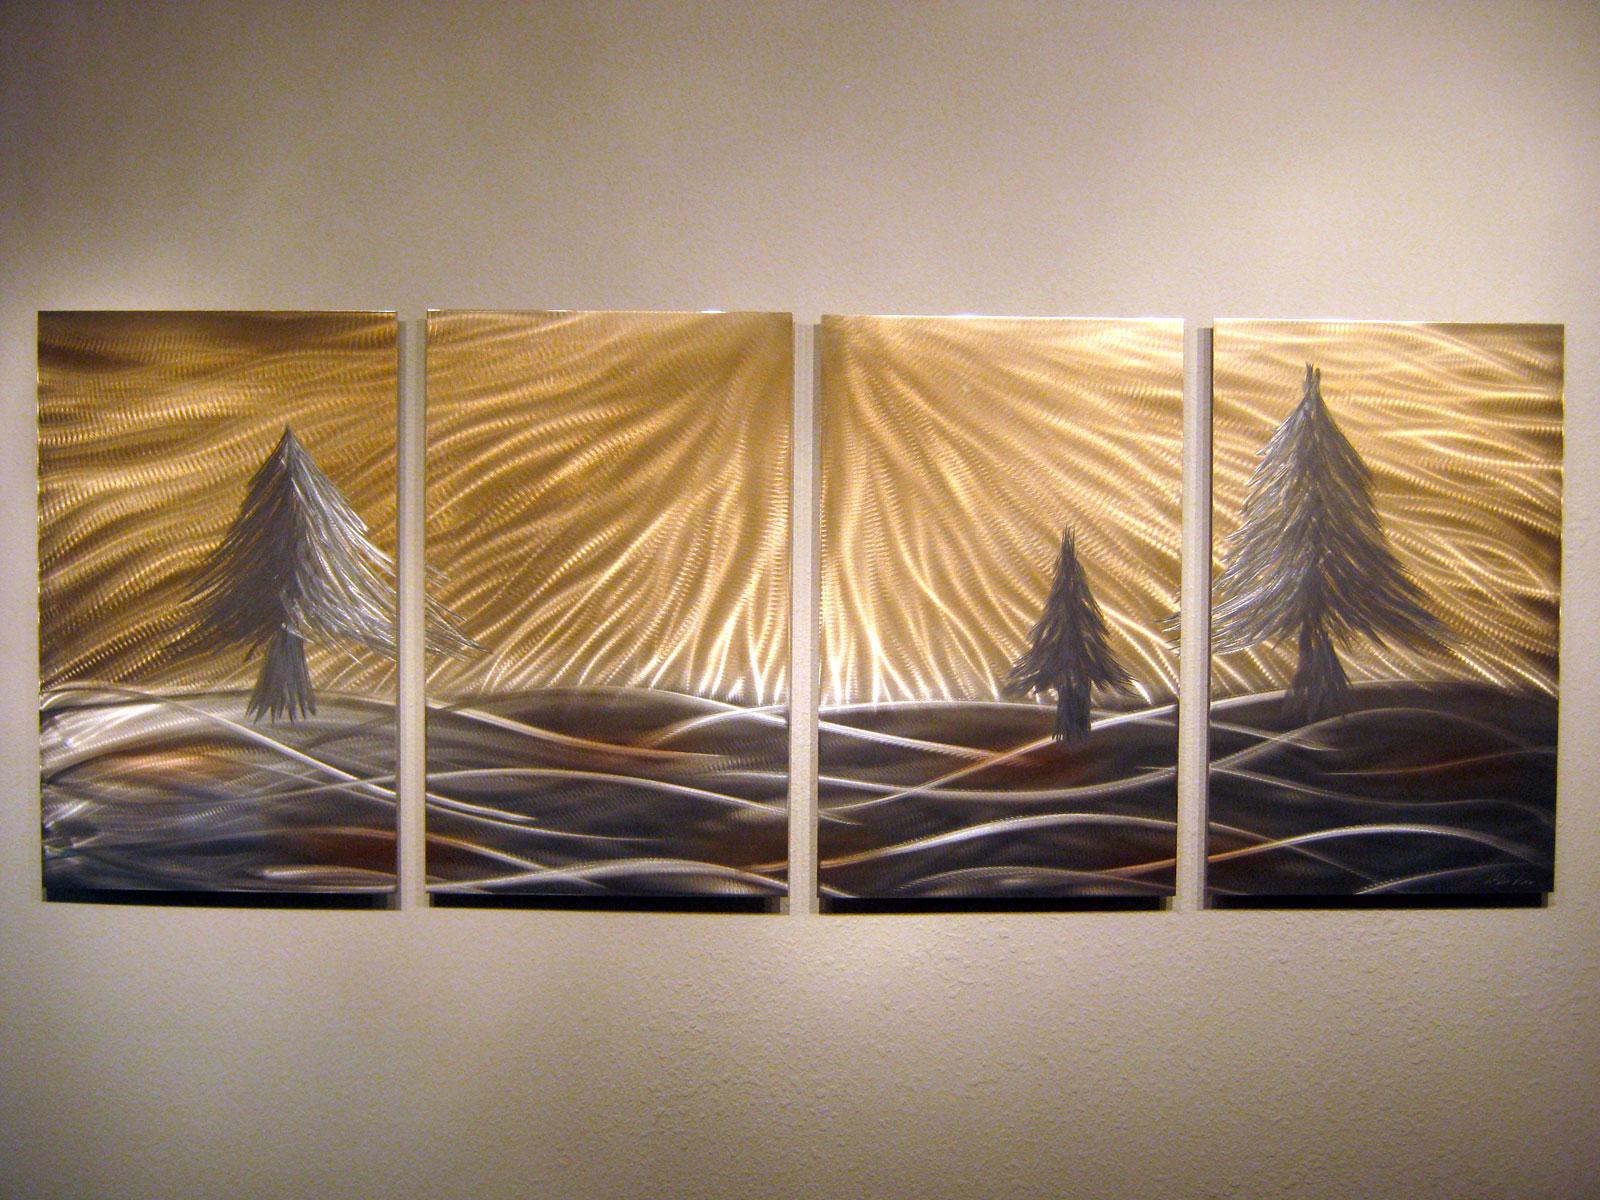 pine trees  abstract metal wall art contemporary modern decor  -  pine trees  abstract metal wall art contemporary modern decor thumbnail